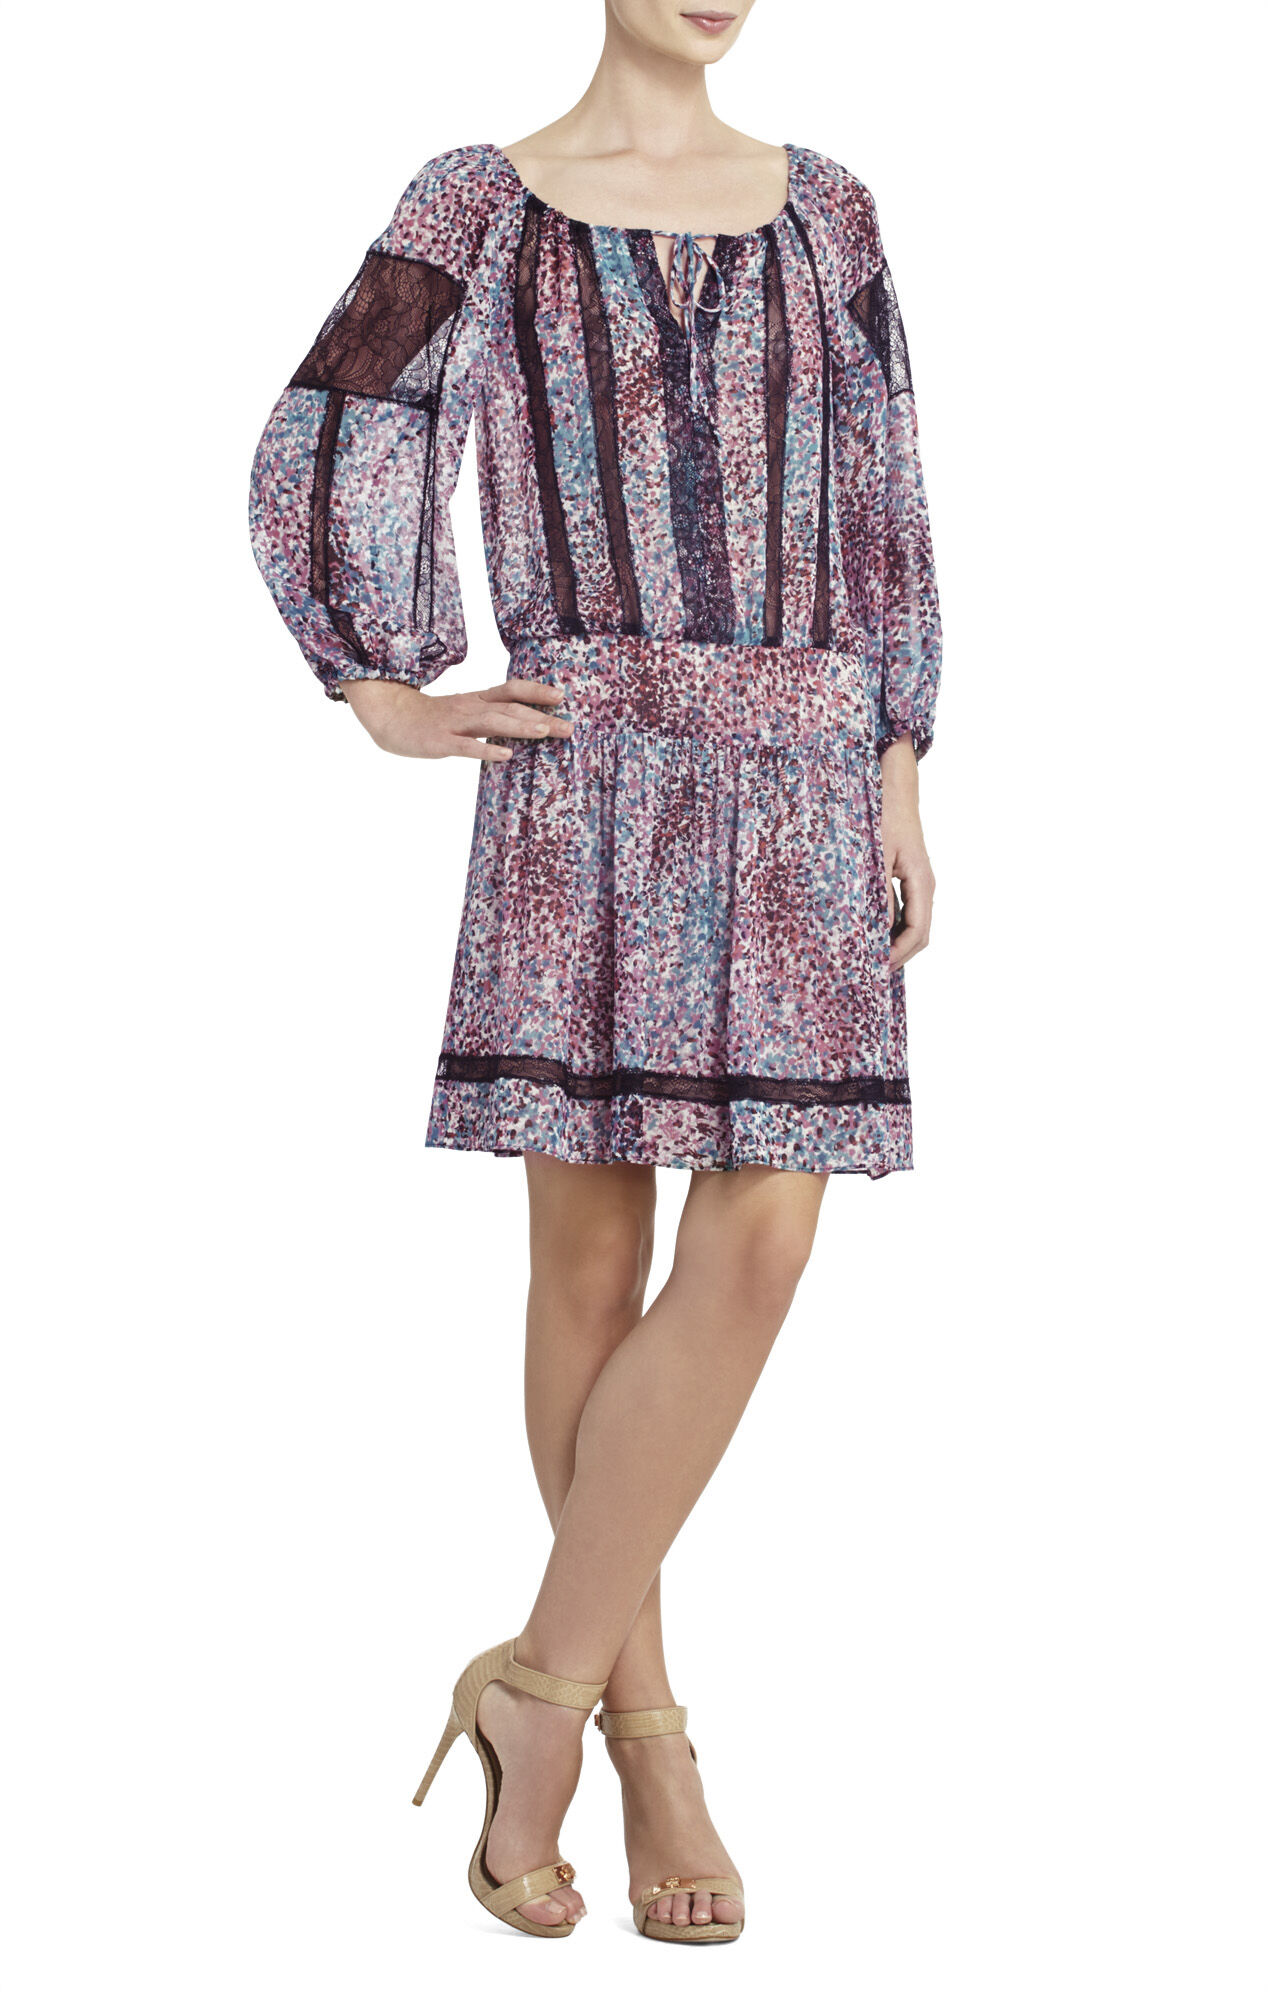 Farra Lace-Blocked Dress